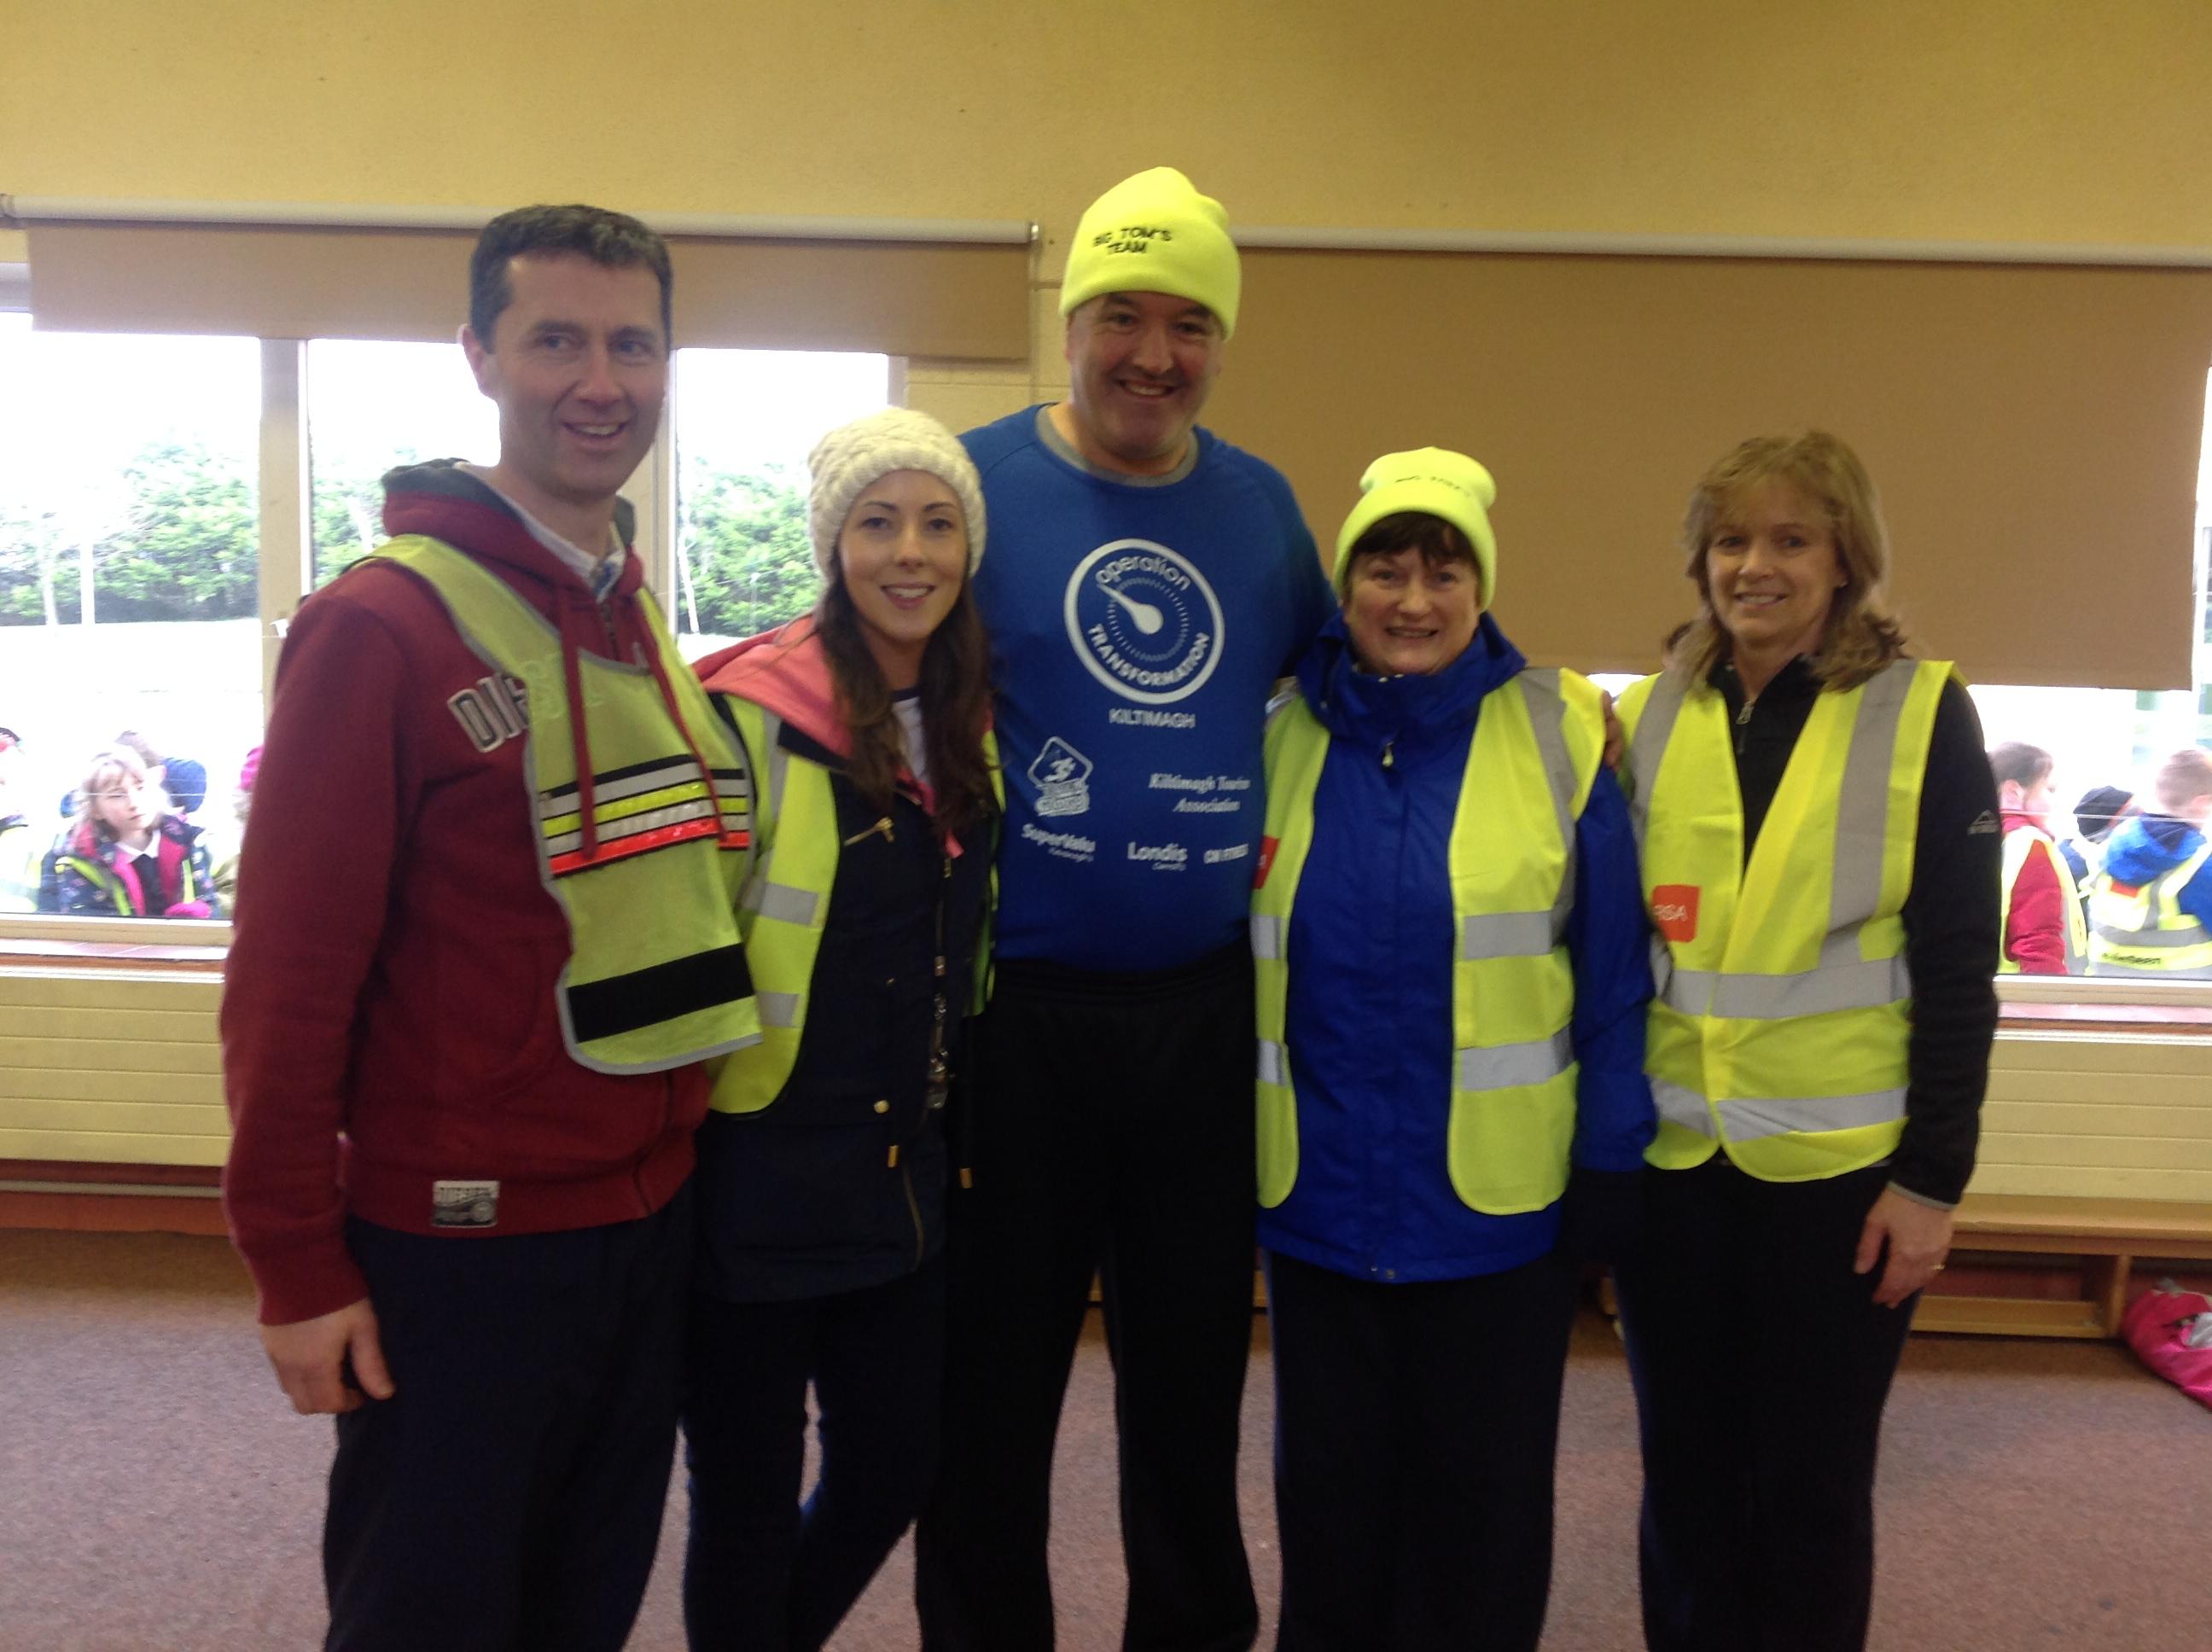 Operation Transformation Leader, Tom Byrne, and staff